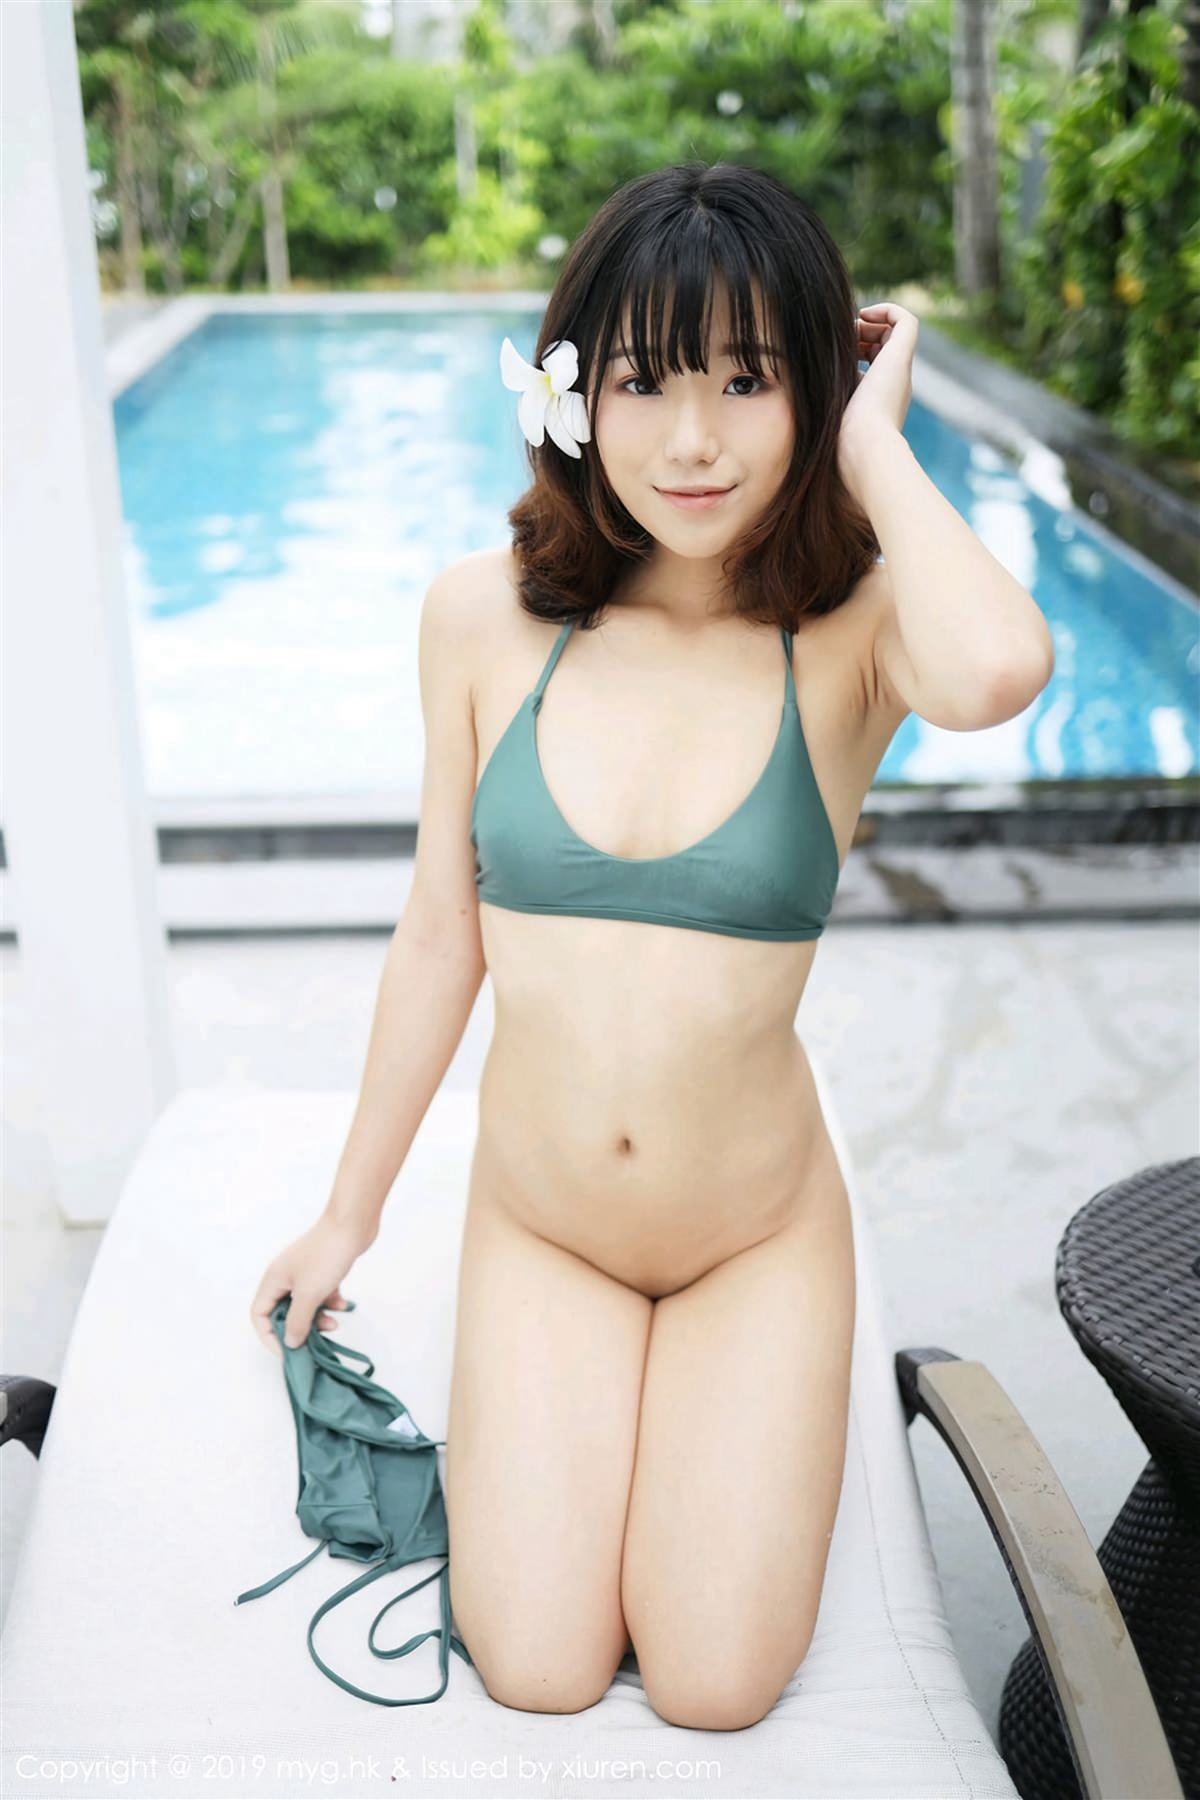 MyGirl Vol.362 45P, Cang Jing You Xiang, mygirl